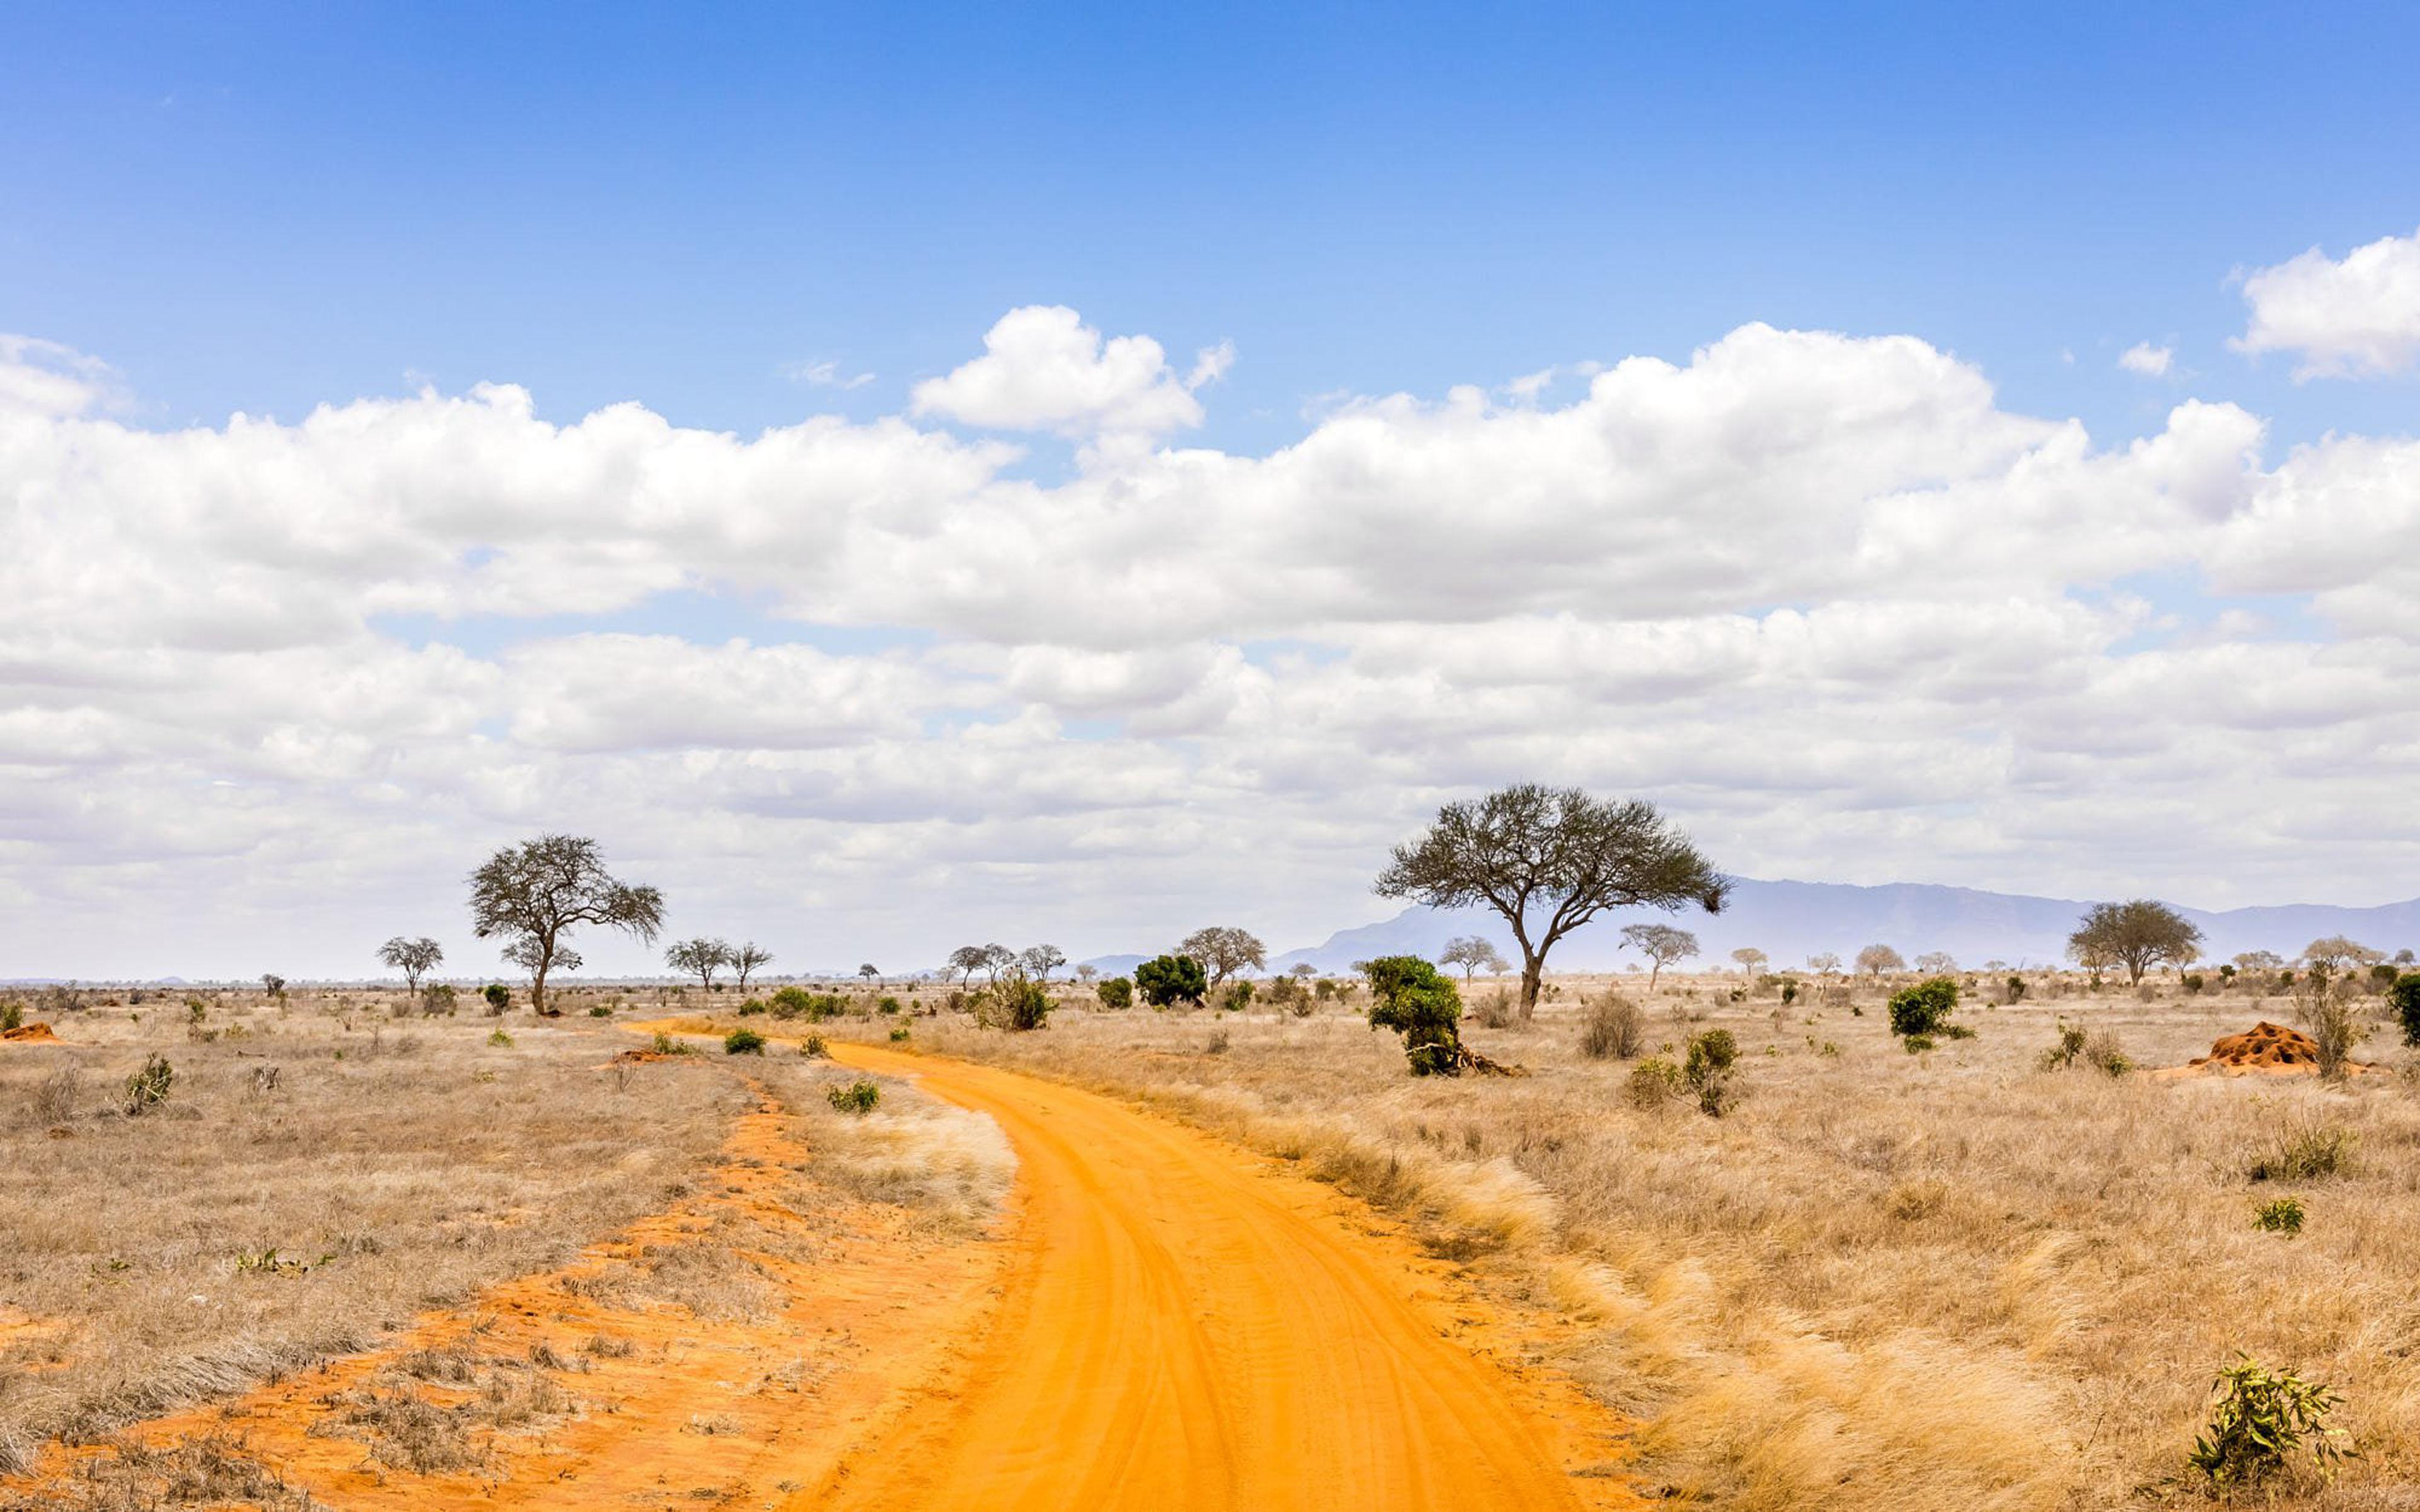 4k ultra hd wallpapers,dirt road,savanna,road,natural environment,vegetation